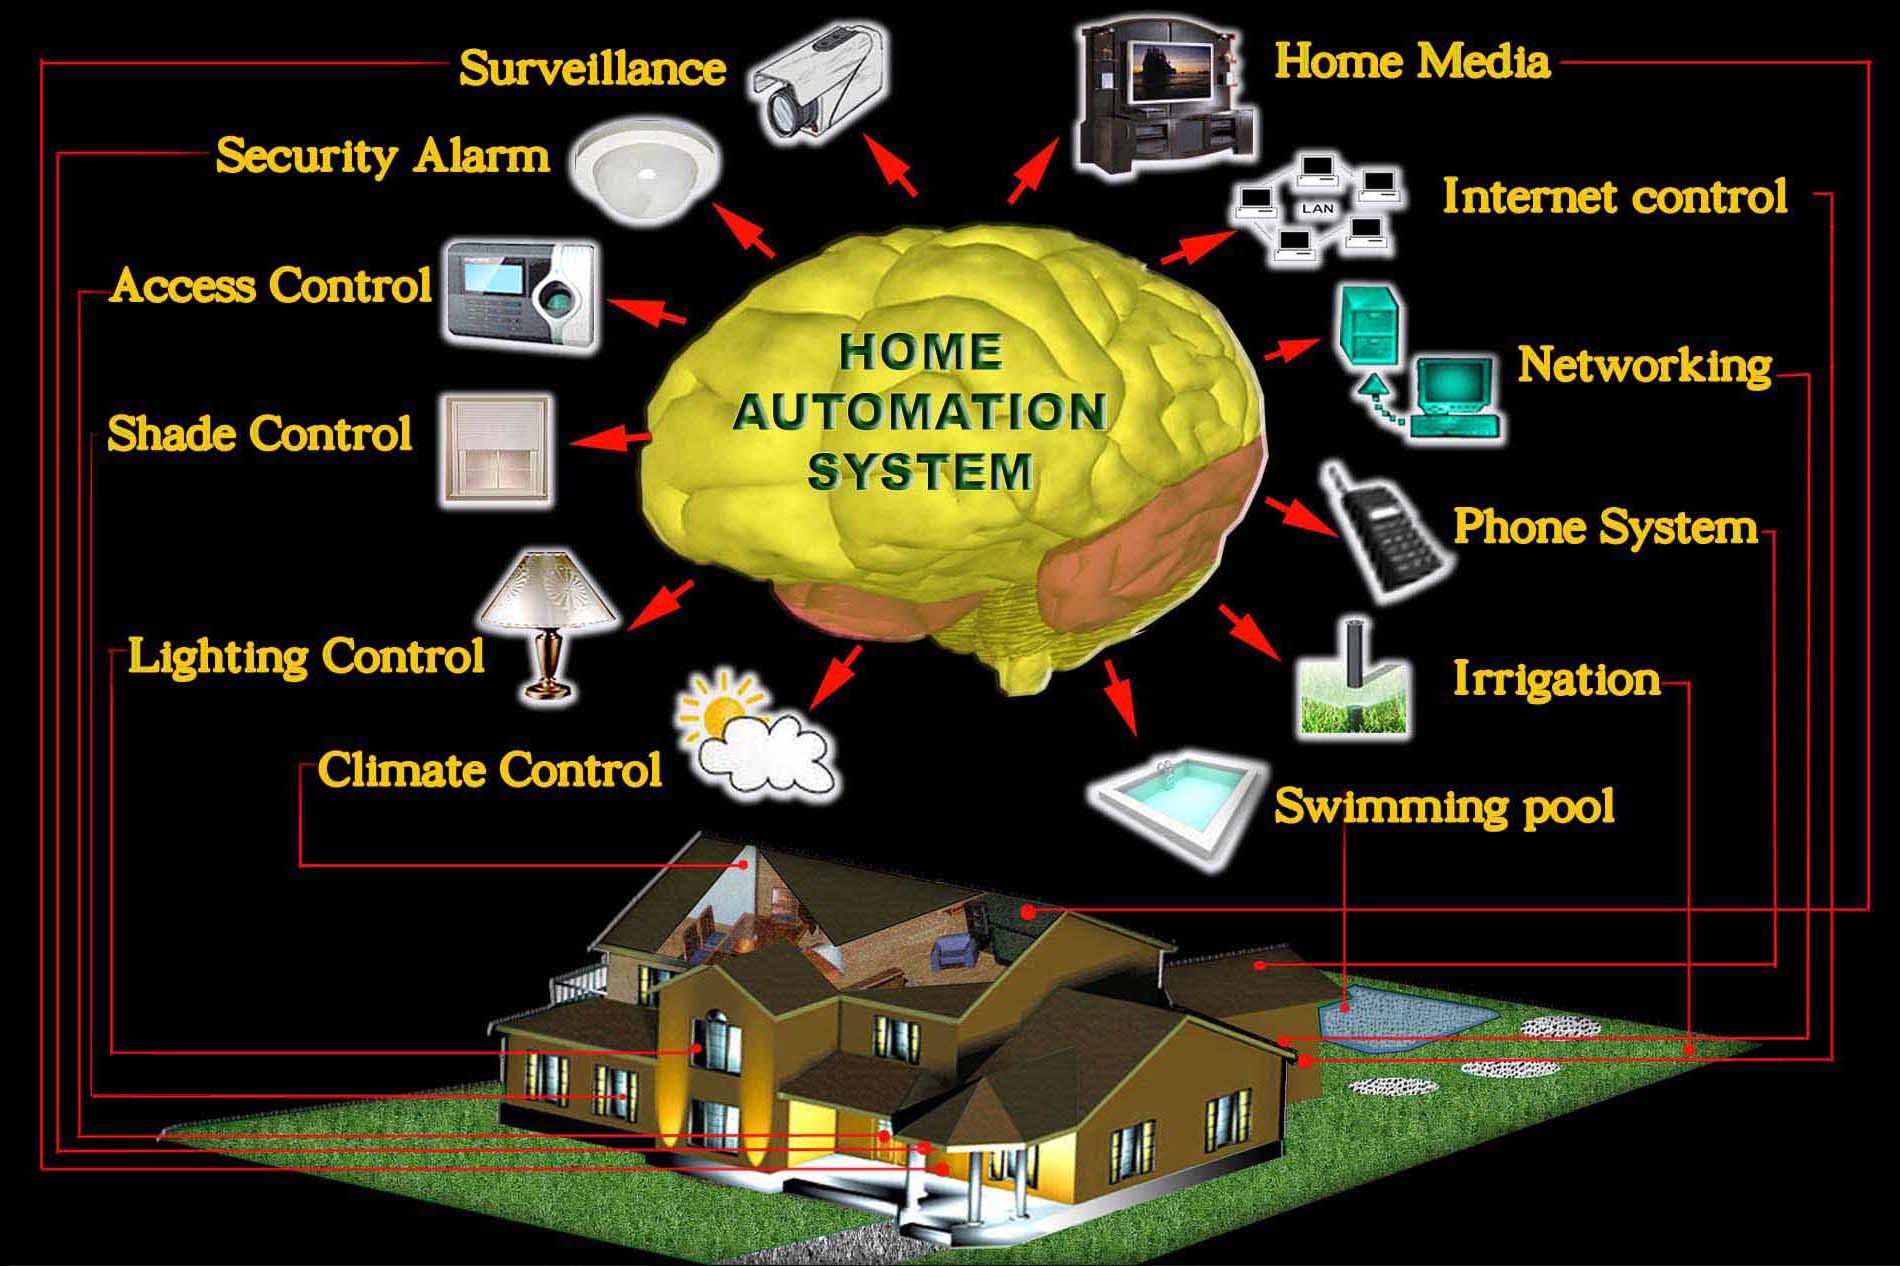 Smart home appliances and setup